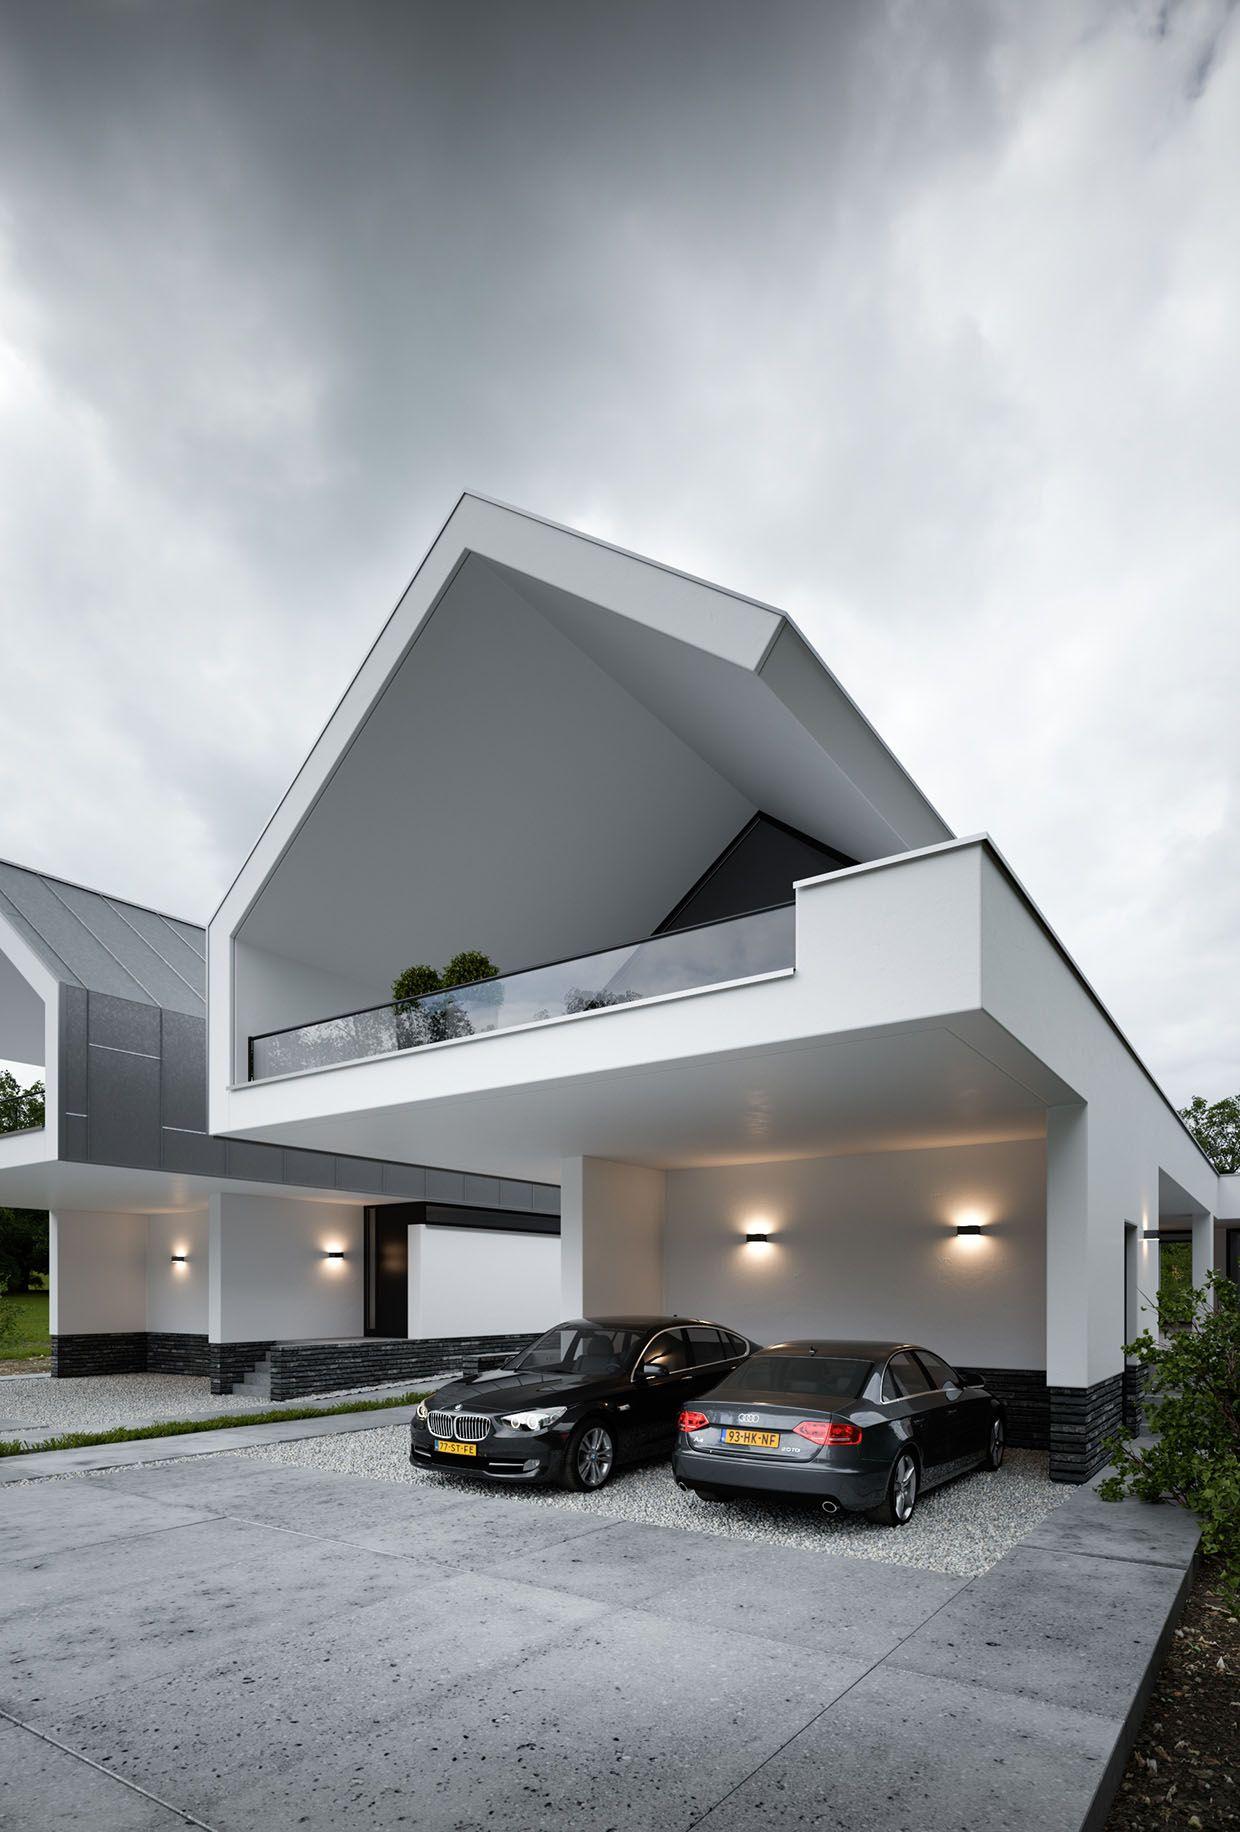 Zwolle architettura architettura moderna architettura for Architettura moderna case